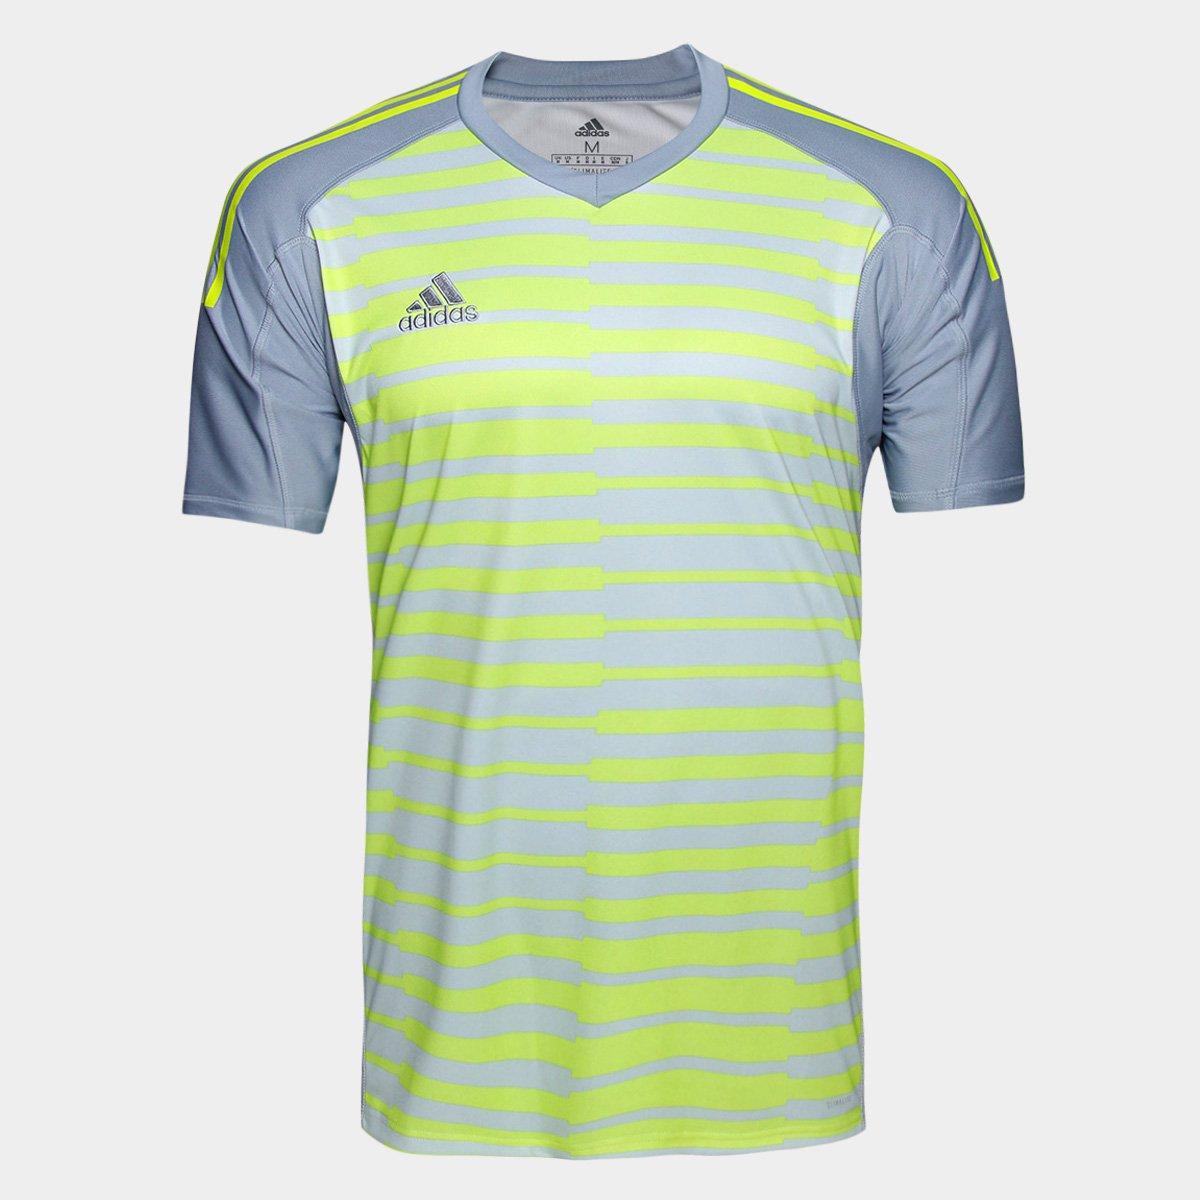 Camisa Adidas Goleiro Adipro 18 Masculina - Cinza e Amarelo - Compre ... 86b252be6e872